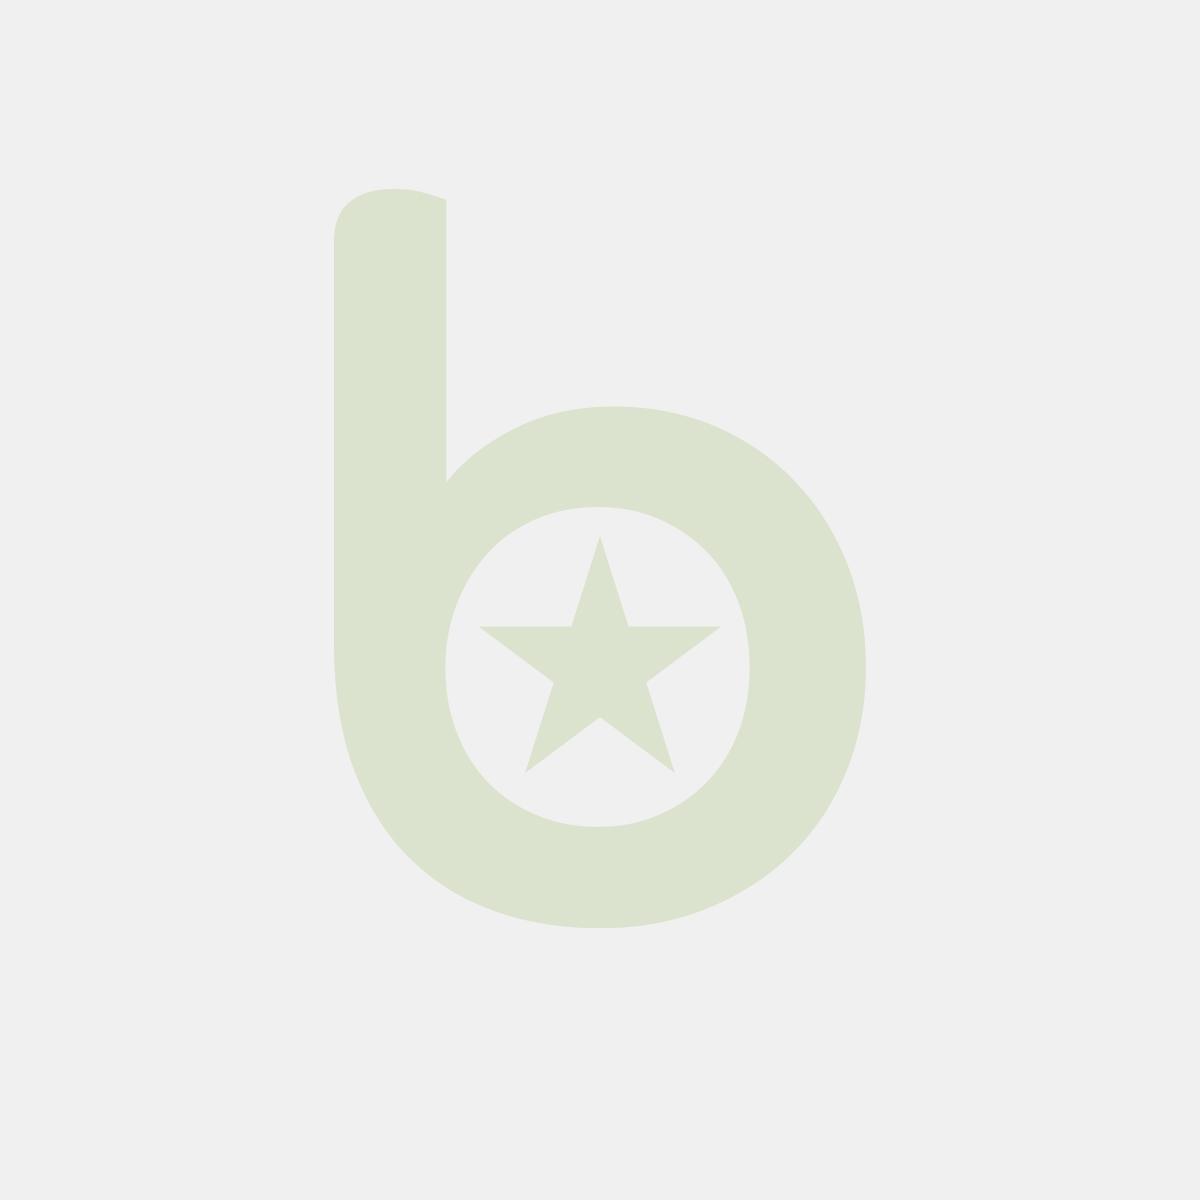 Miseczka FINGERFOOD czarna, 7,2/7,2 cm, PS, 25 szt. w opakowaniu